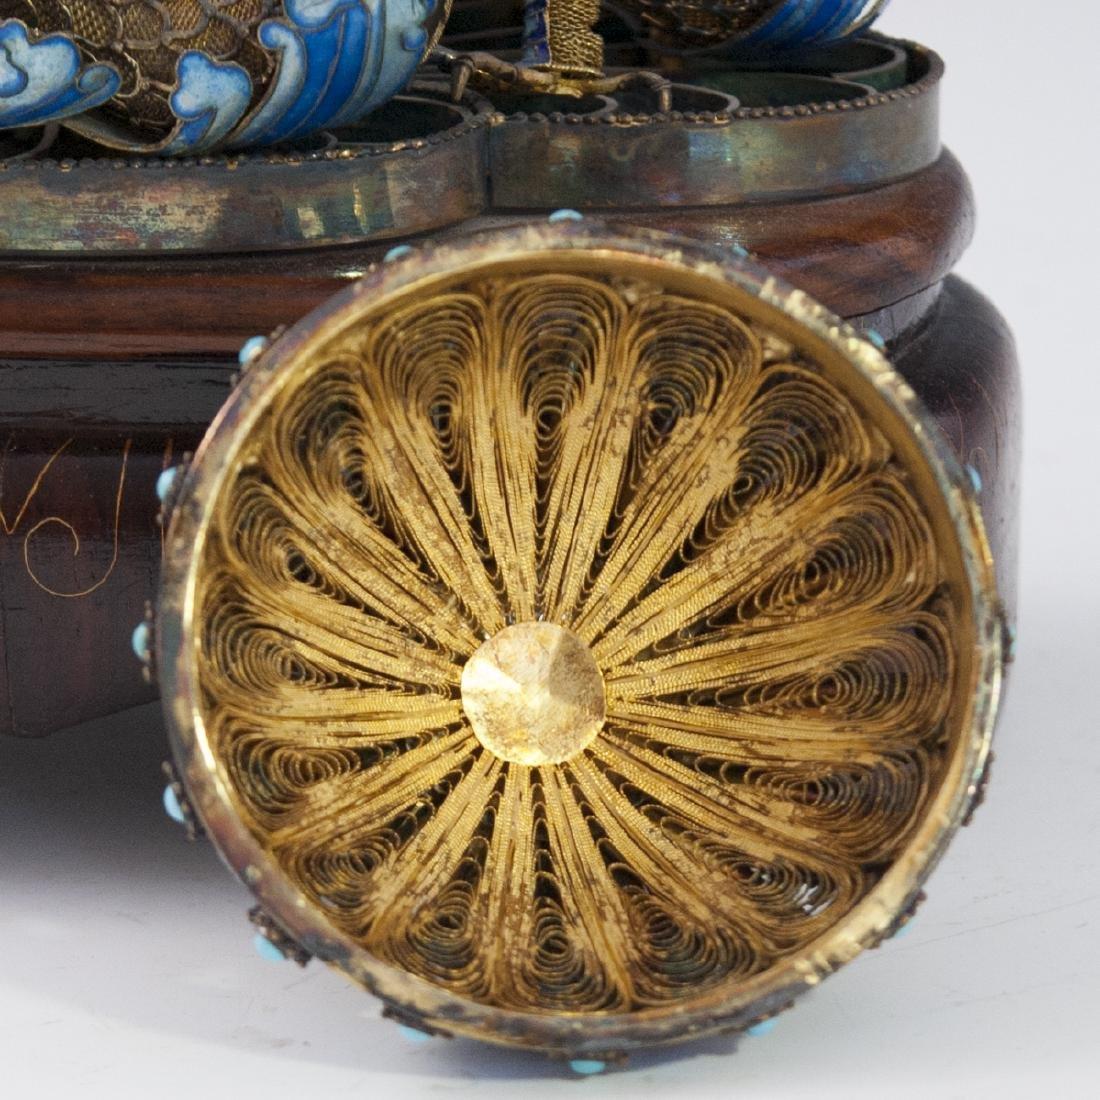 Chinese Vermeil Silver Enamel Cloisonne Caddy - 3